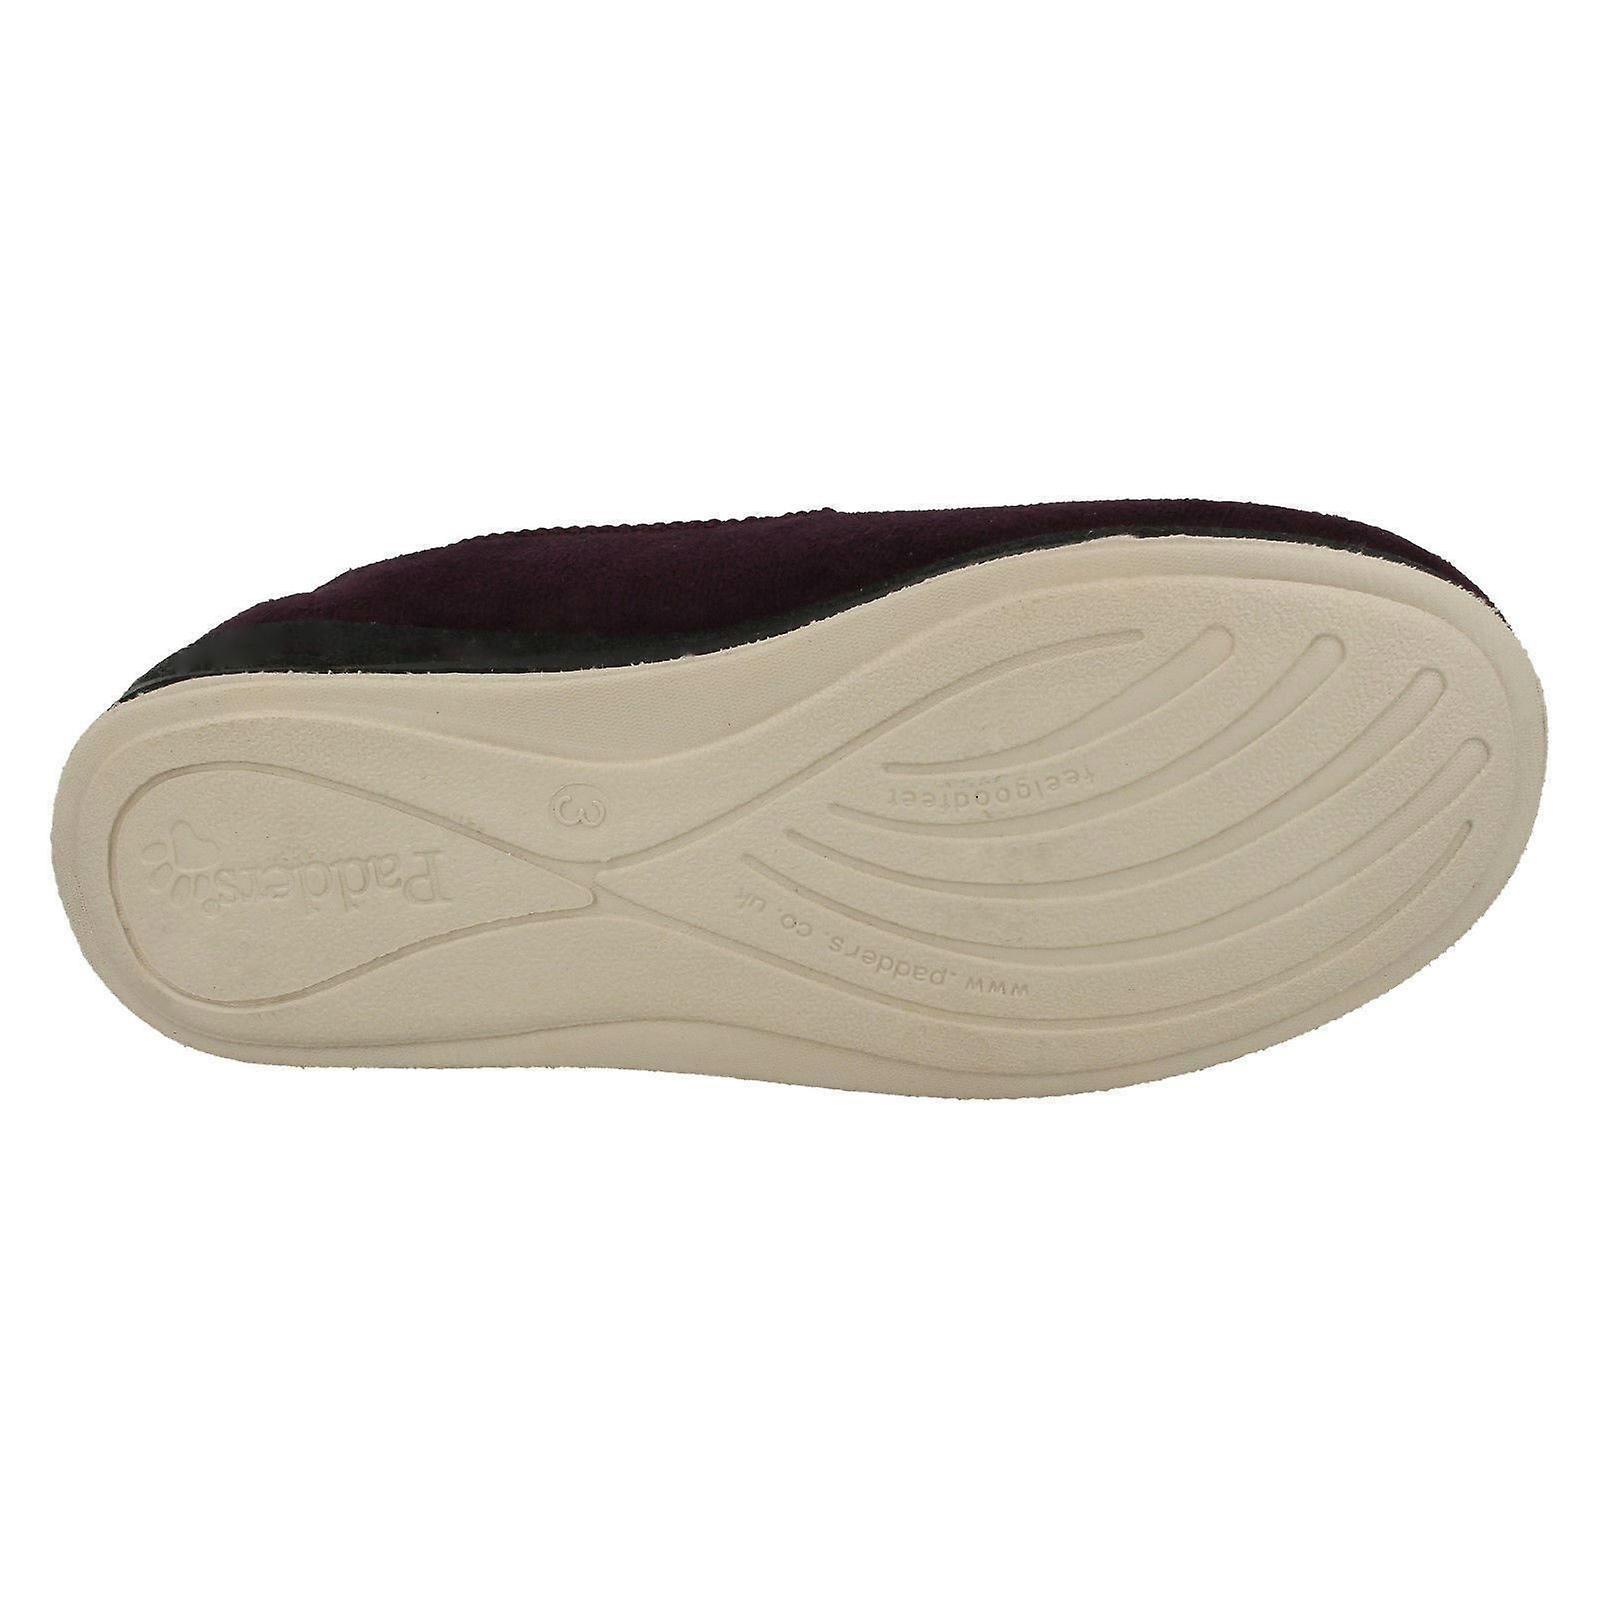 43 EU 11 Size Repose Padders Size Size Textile On 9 Purple Slipper Ladies Slip US UK Shoes 18 2E 4OZ6qwg